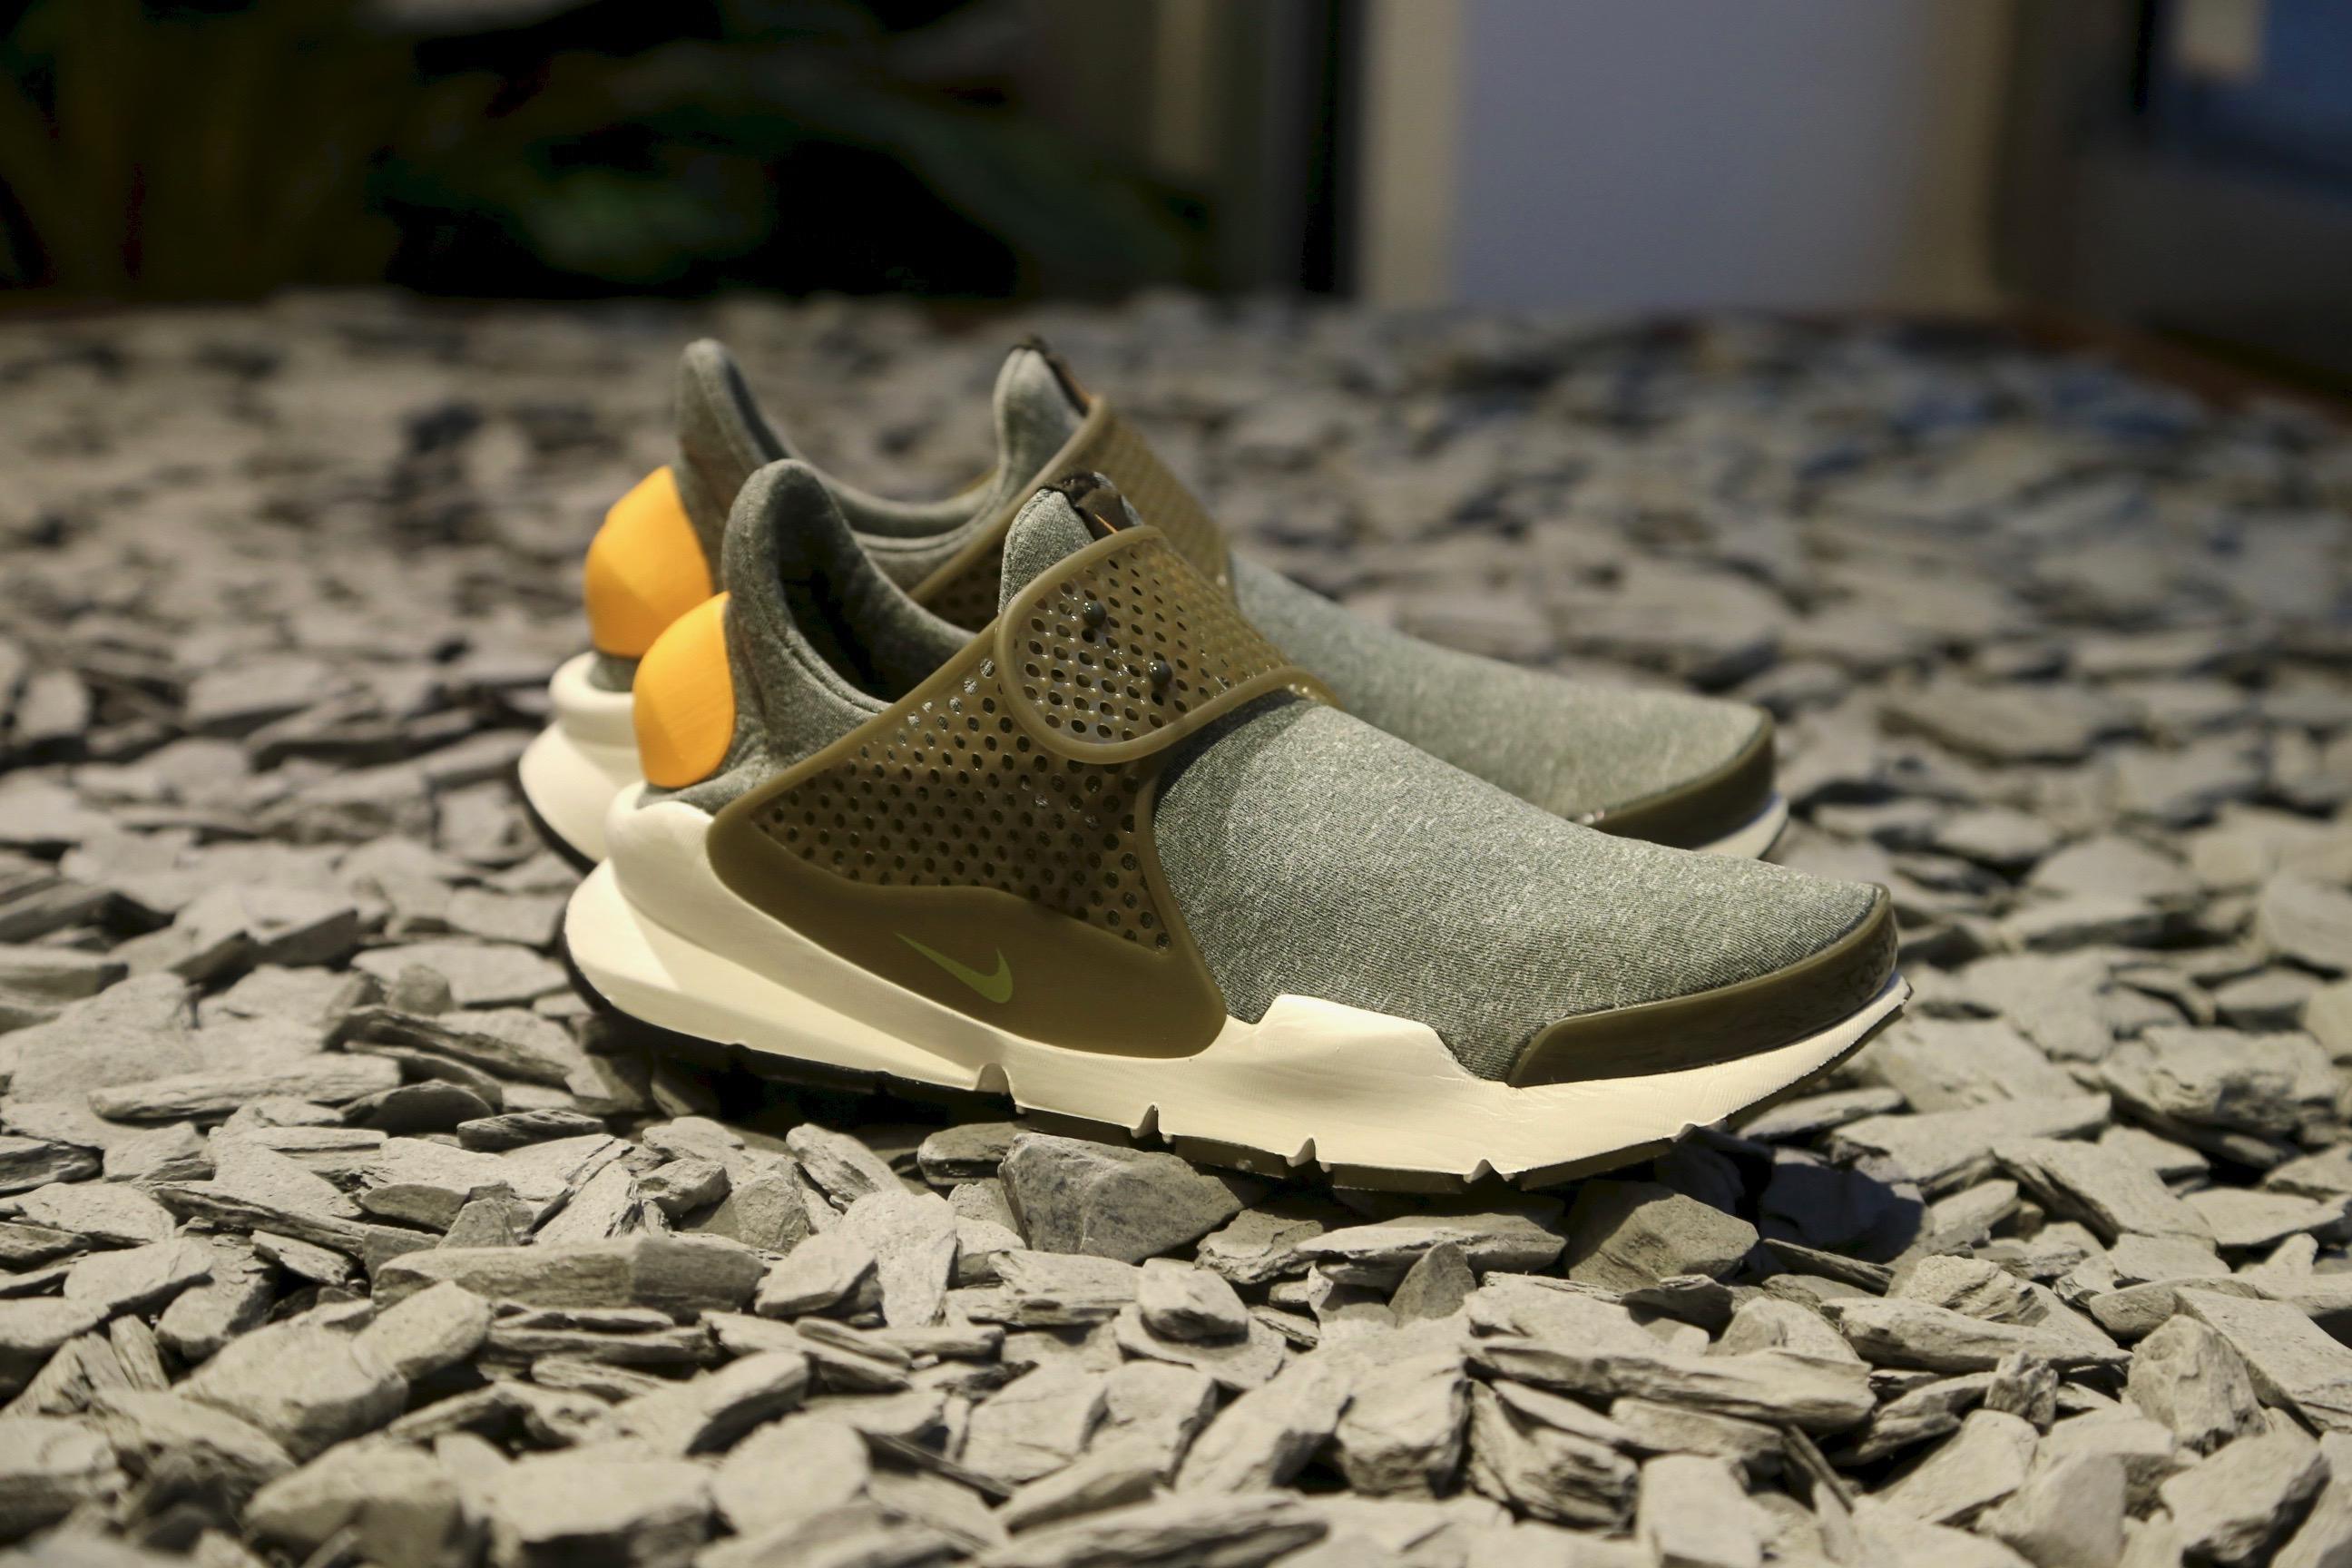 Nike Wmns Sock Dart SE – Dark Loden